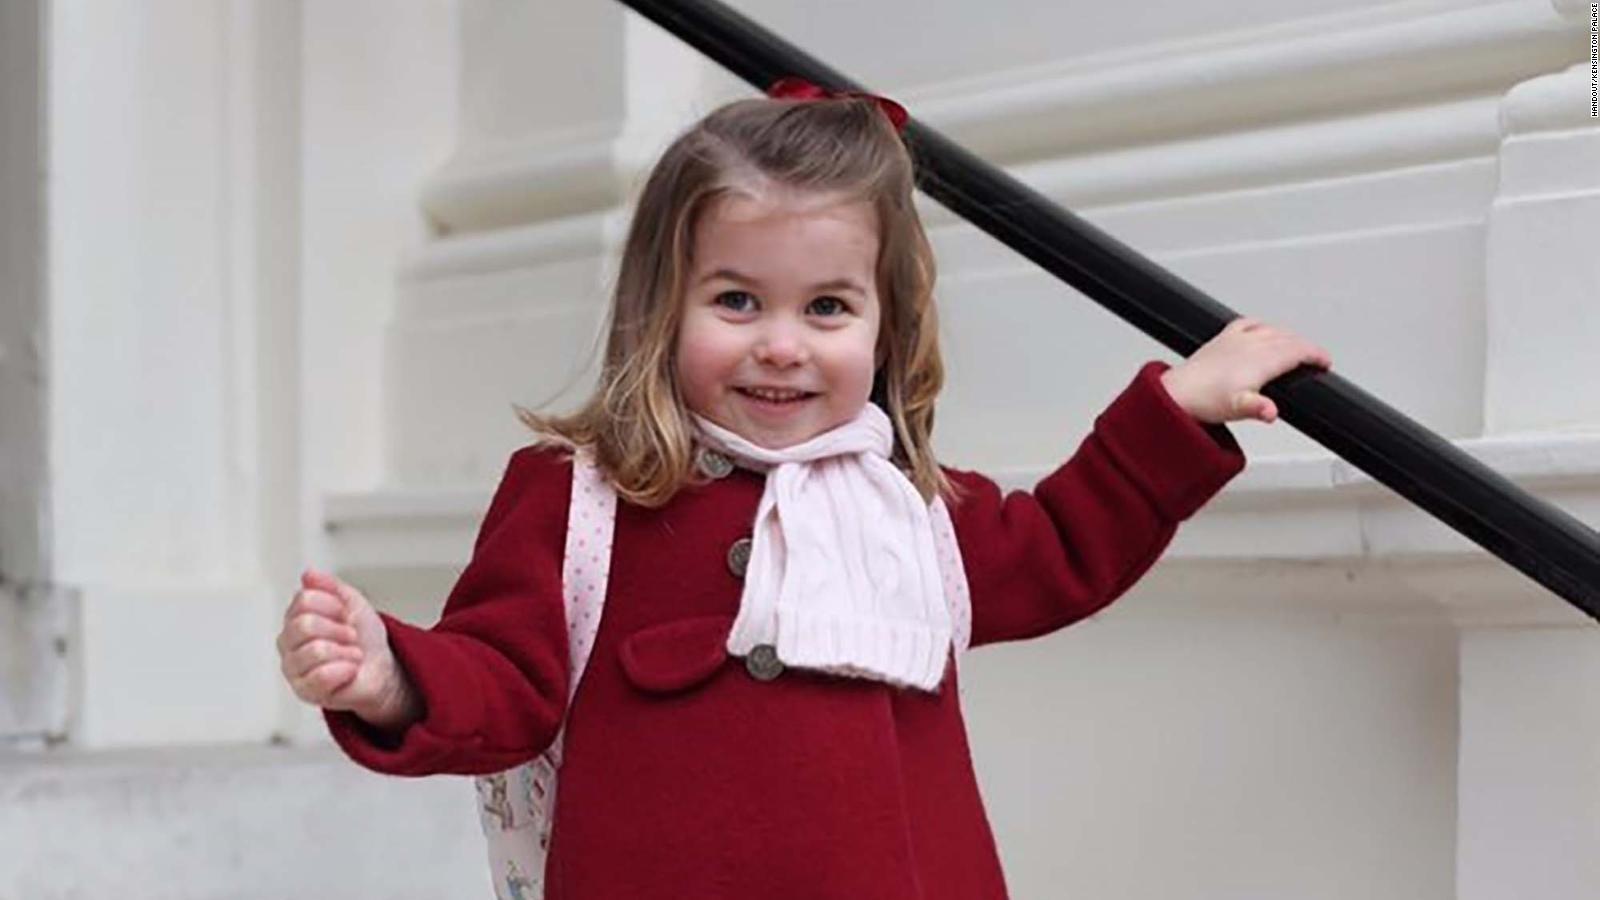 180108161026 01 princess charlotte starts nursery school 0108 full 169.jpg?resize=1200,630 - 8 regras que a princesa Charlotte já é obrigada a seguir